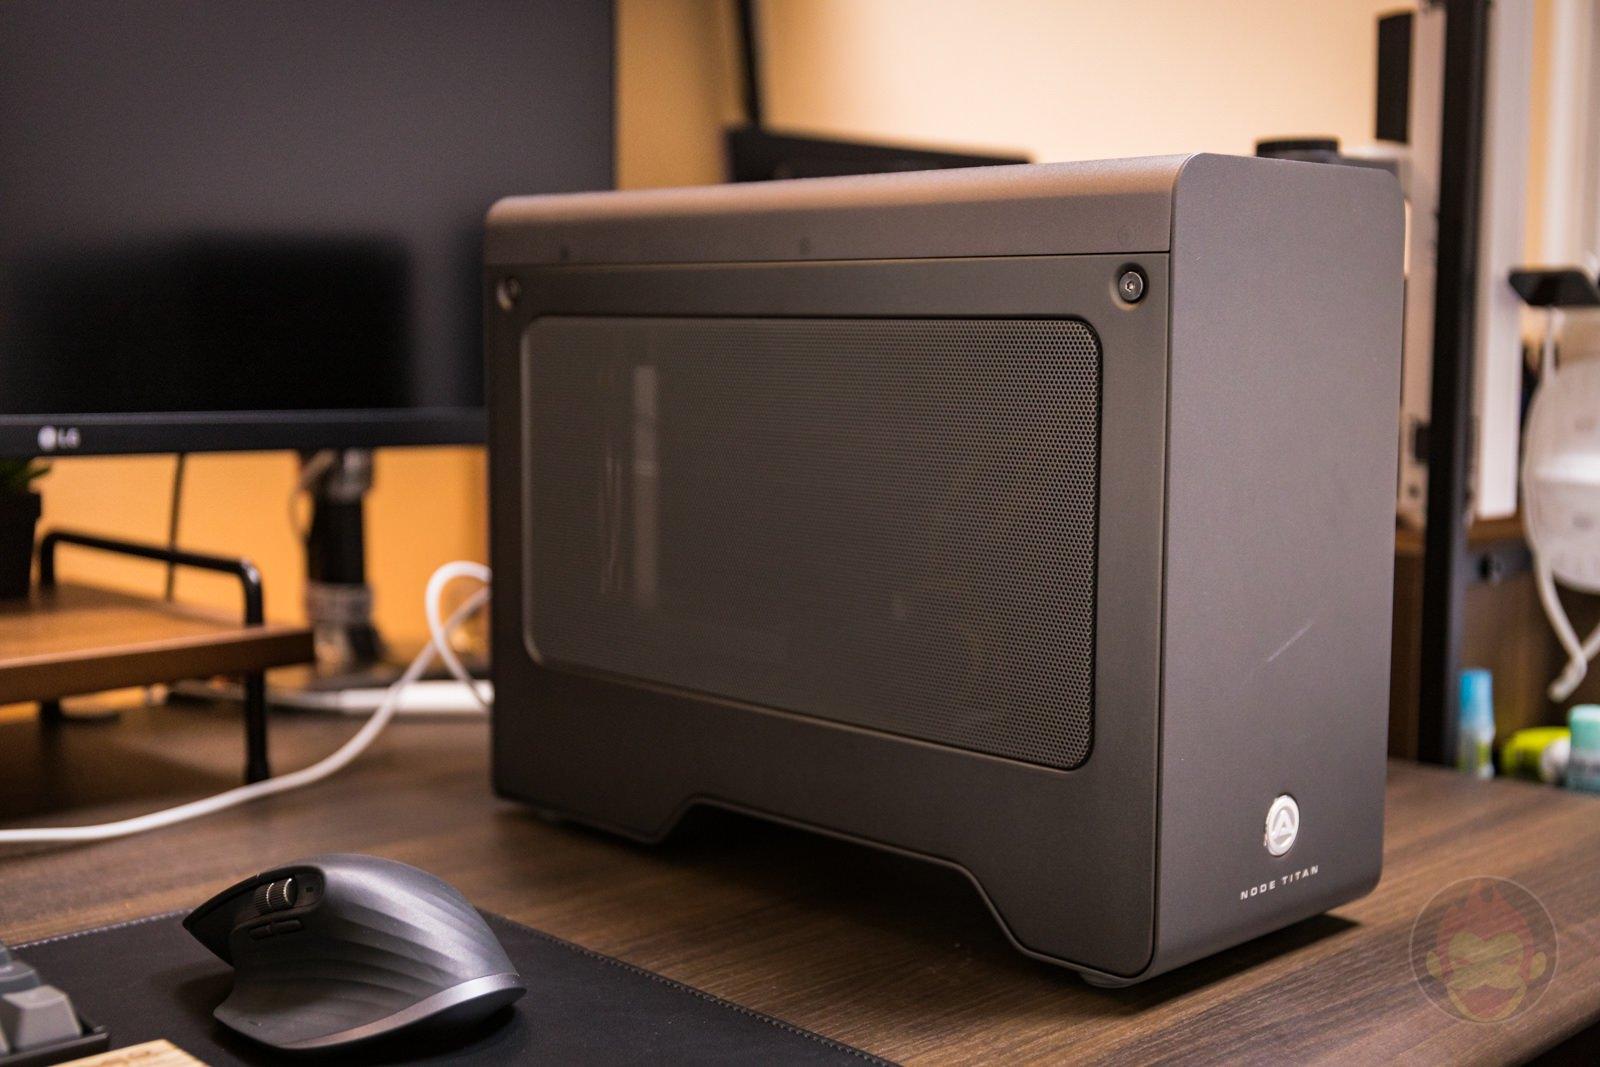 AKiTiO Node Titan with msi AMD Radeon RX 5700 XT Review 01